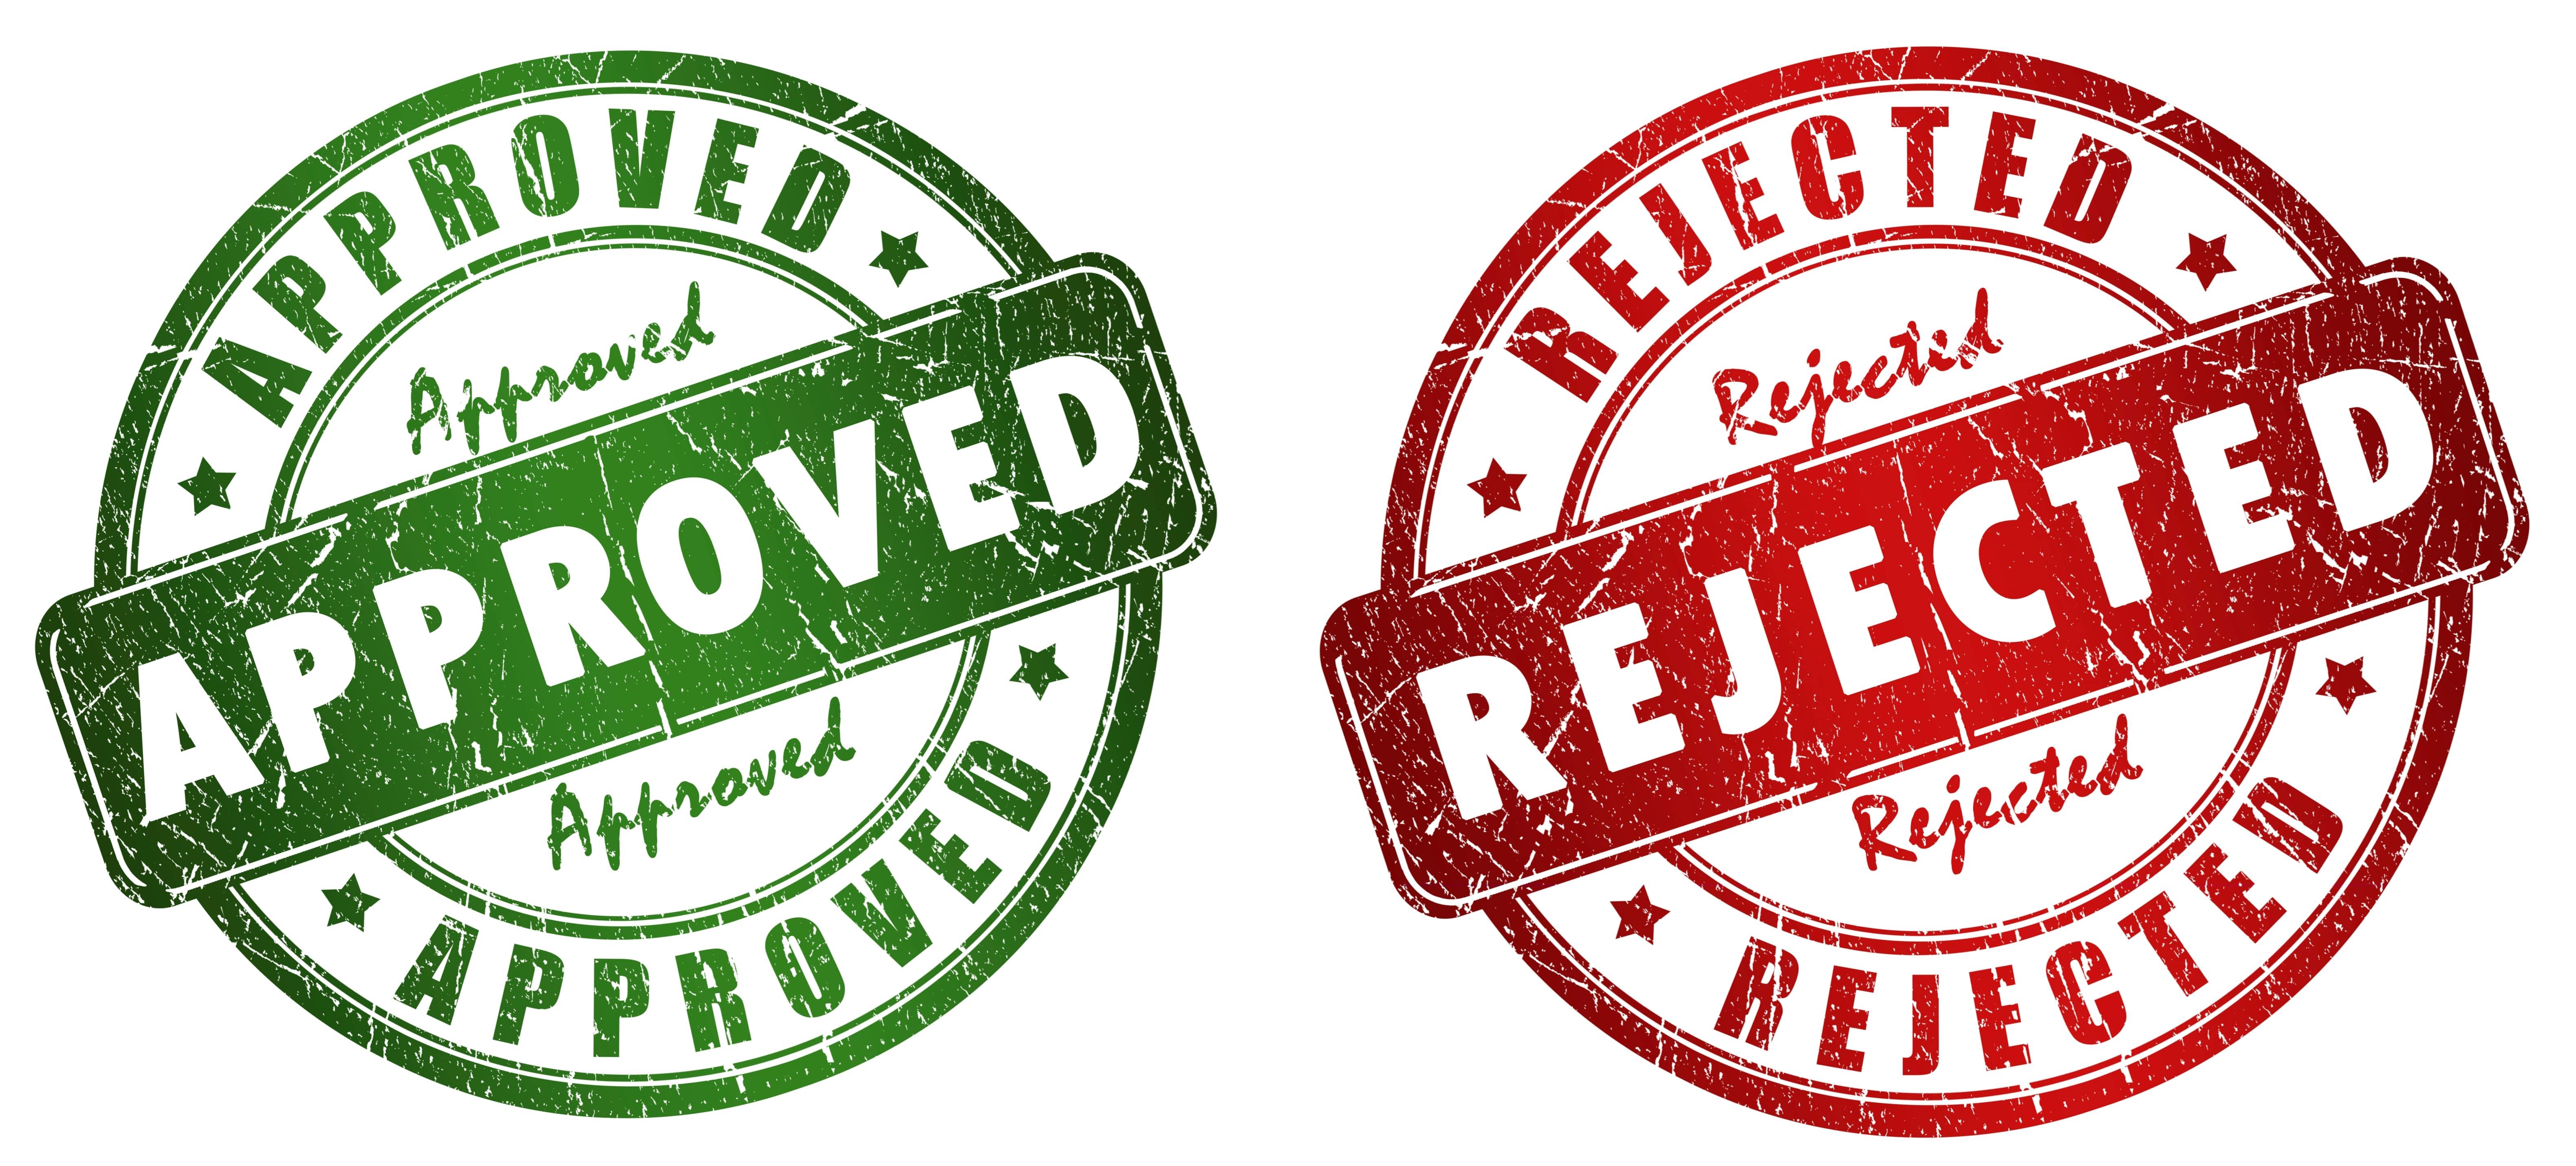 Promotional Compliance Audits | Planogram Assessment Reports